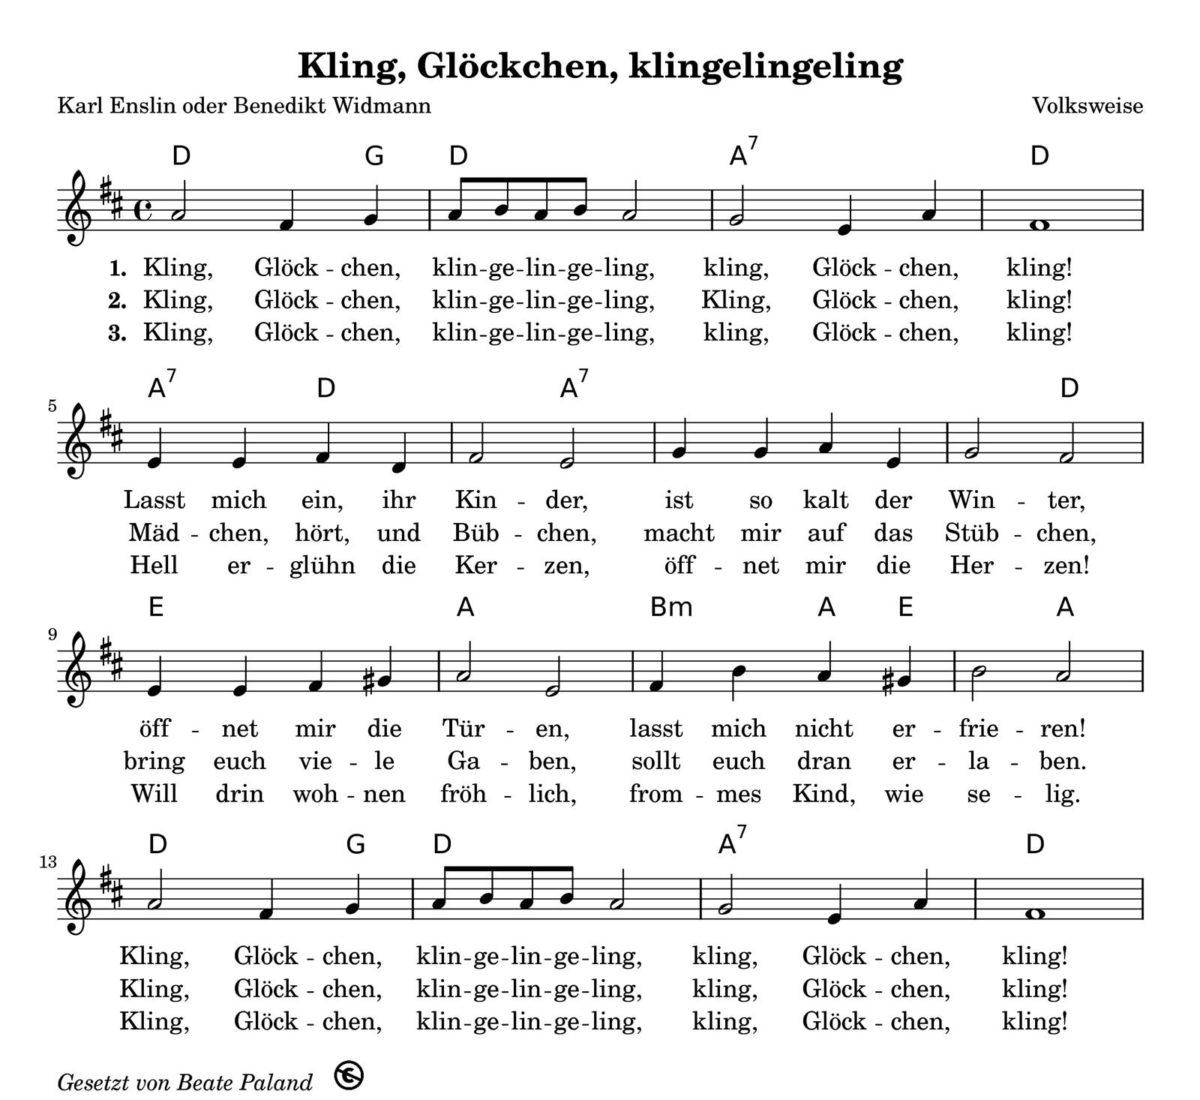 Kling, Glöckchen, Klingelingeling | Babyduda innen Kling Glöckchen Klingelingeling Text